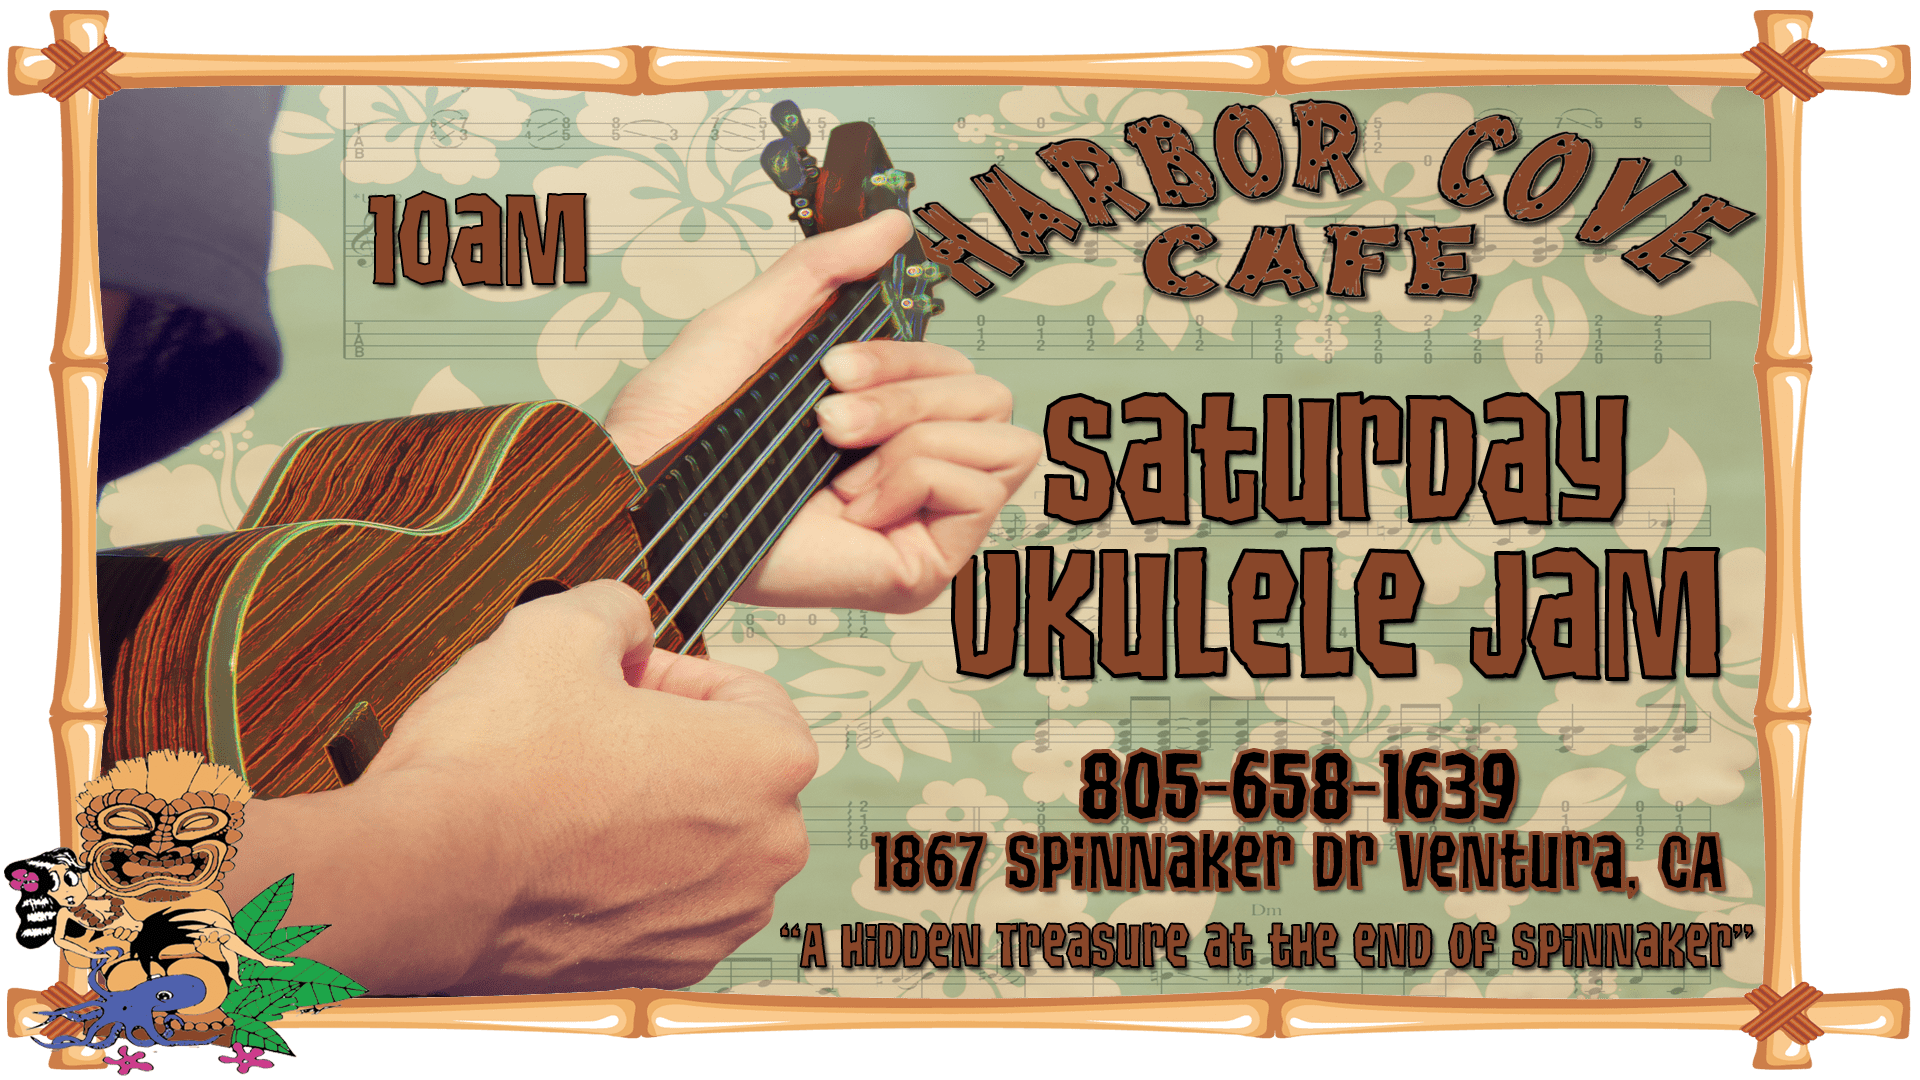 Saturday Night Ukulele Jams at Harbor Cove Cafe